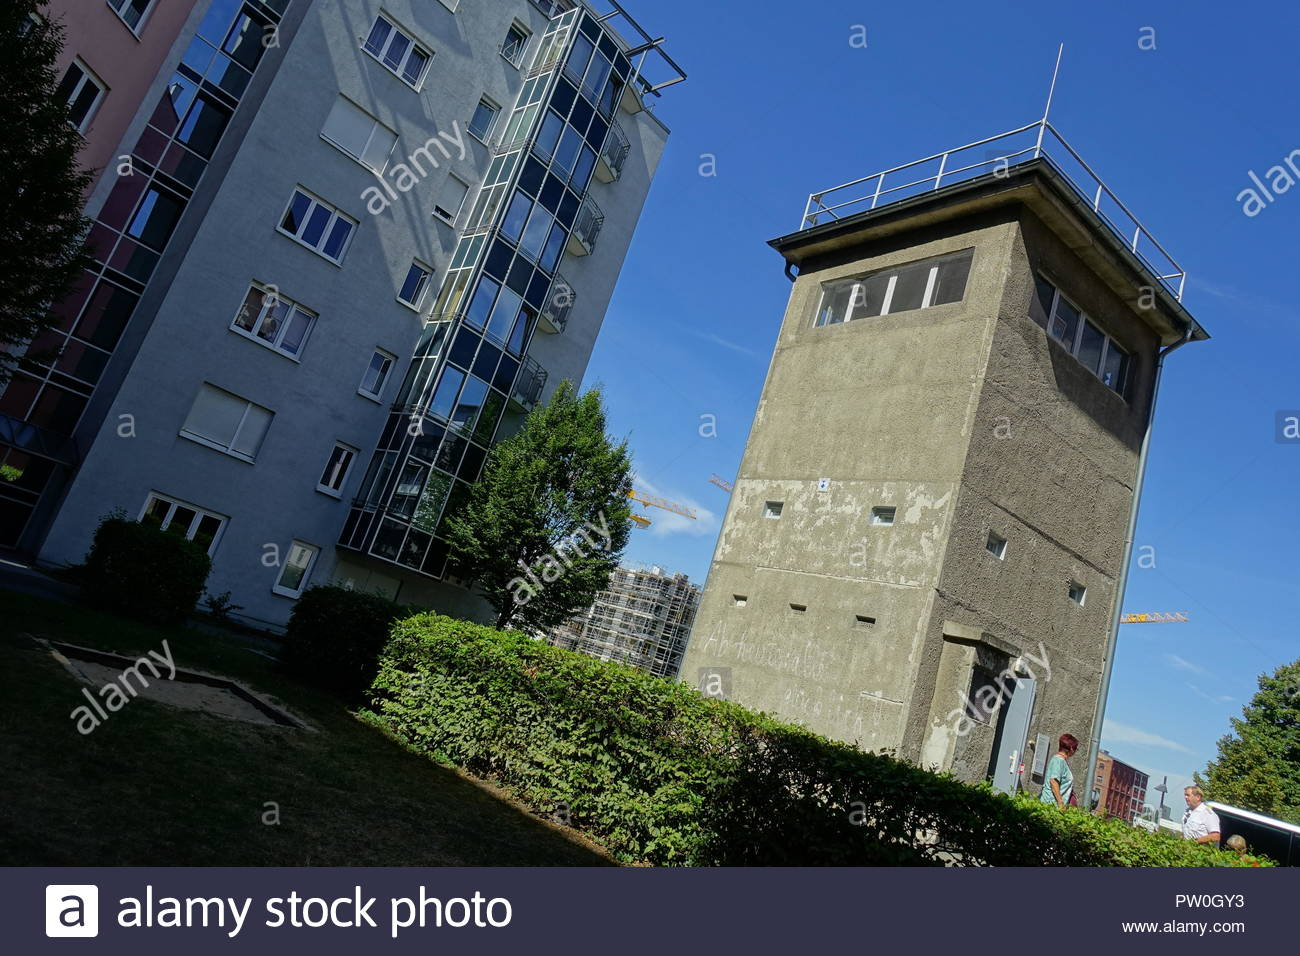 Berliner Mauer, Wachturm am Kieler Eck, Gedenkstätte Günter Litfin, Berlin Wall, Watchtower Kieler Eck (https://www.gedenkstaette-guenter-litfin.de/) - Stock Image